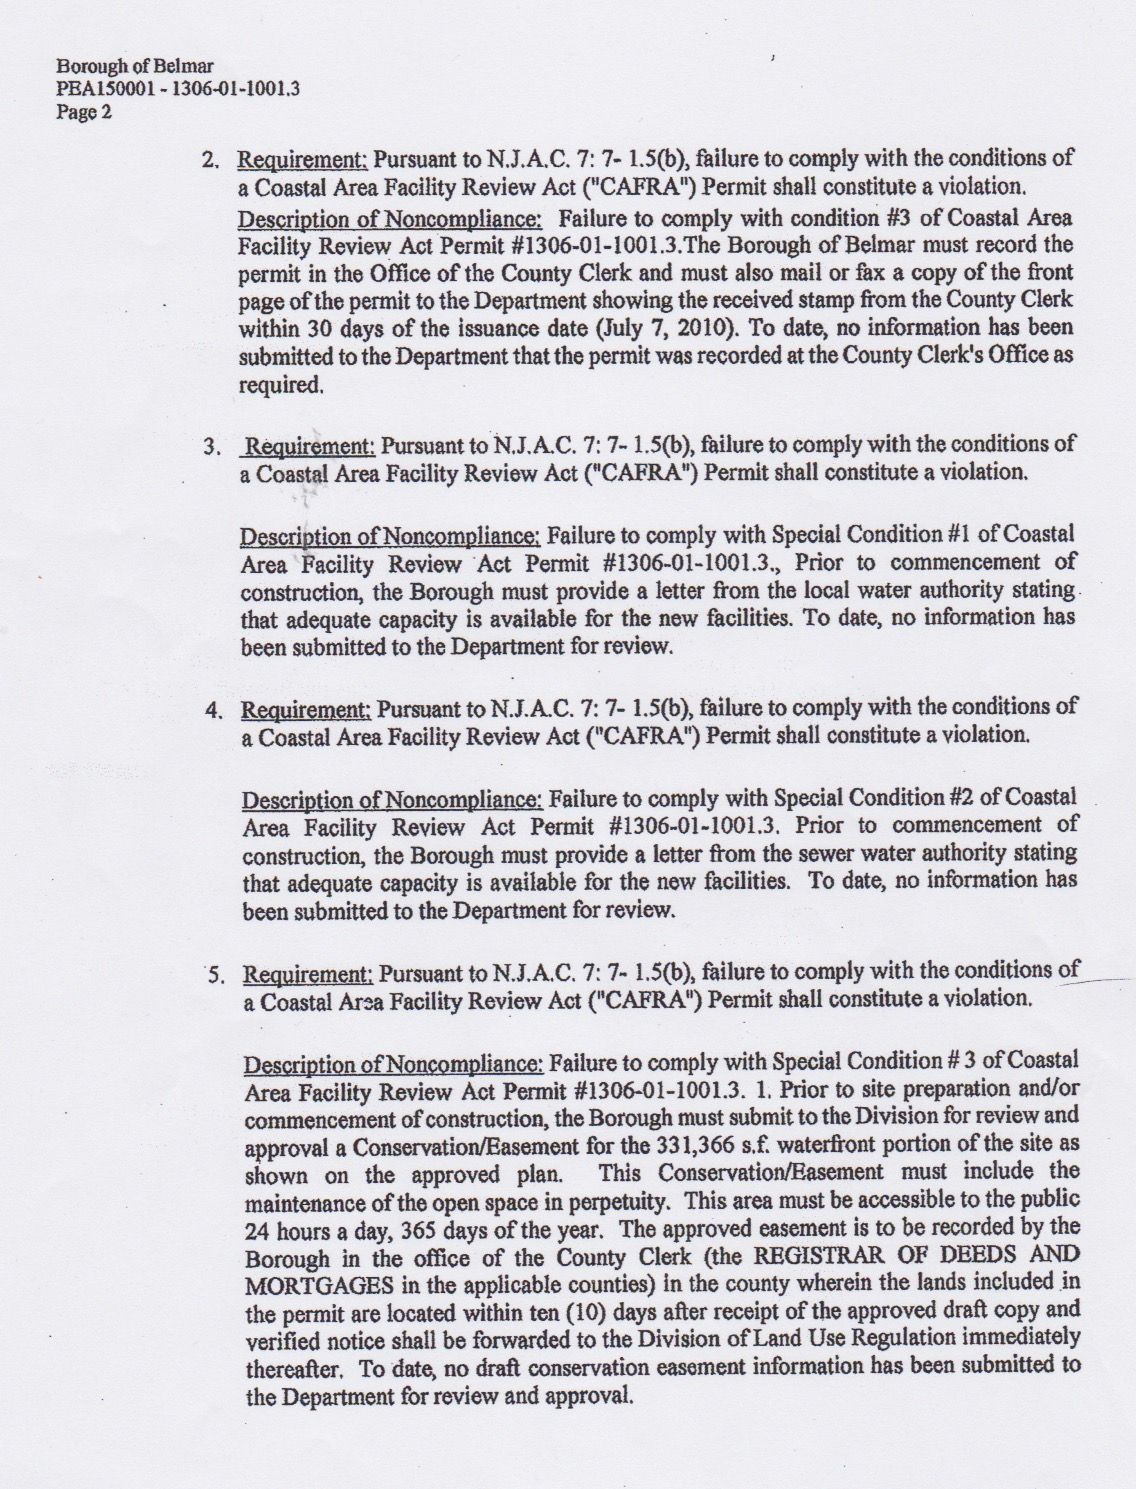 cafra violation notice 2